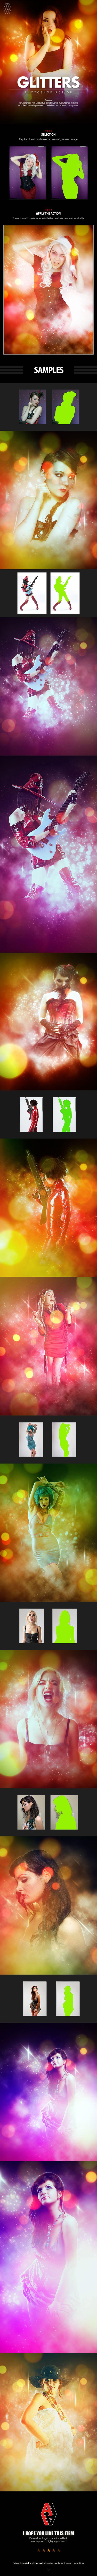 Glitters Photoshop Action — Photoshop ATN #bright #actionart • Download ➝ https://graphicriver.net/item/glitters-photoshop-action/19051771?ref=pxcr